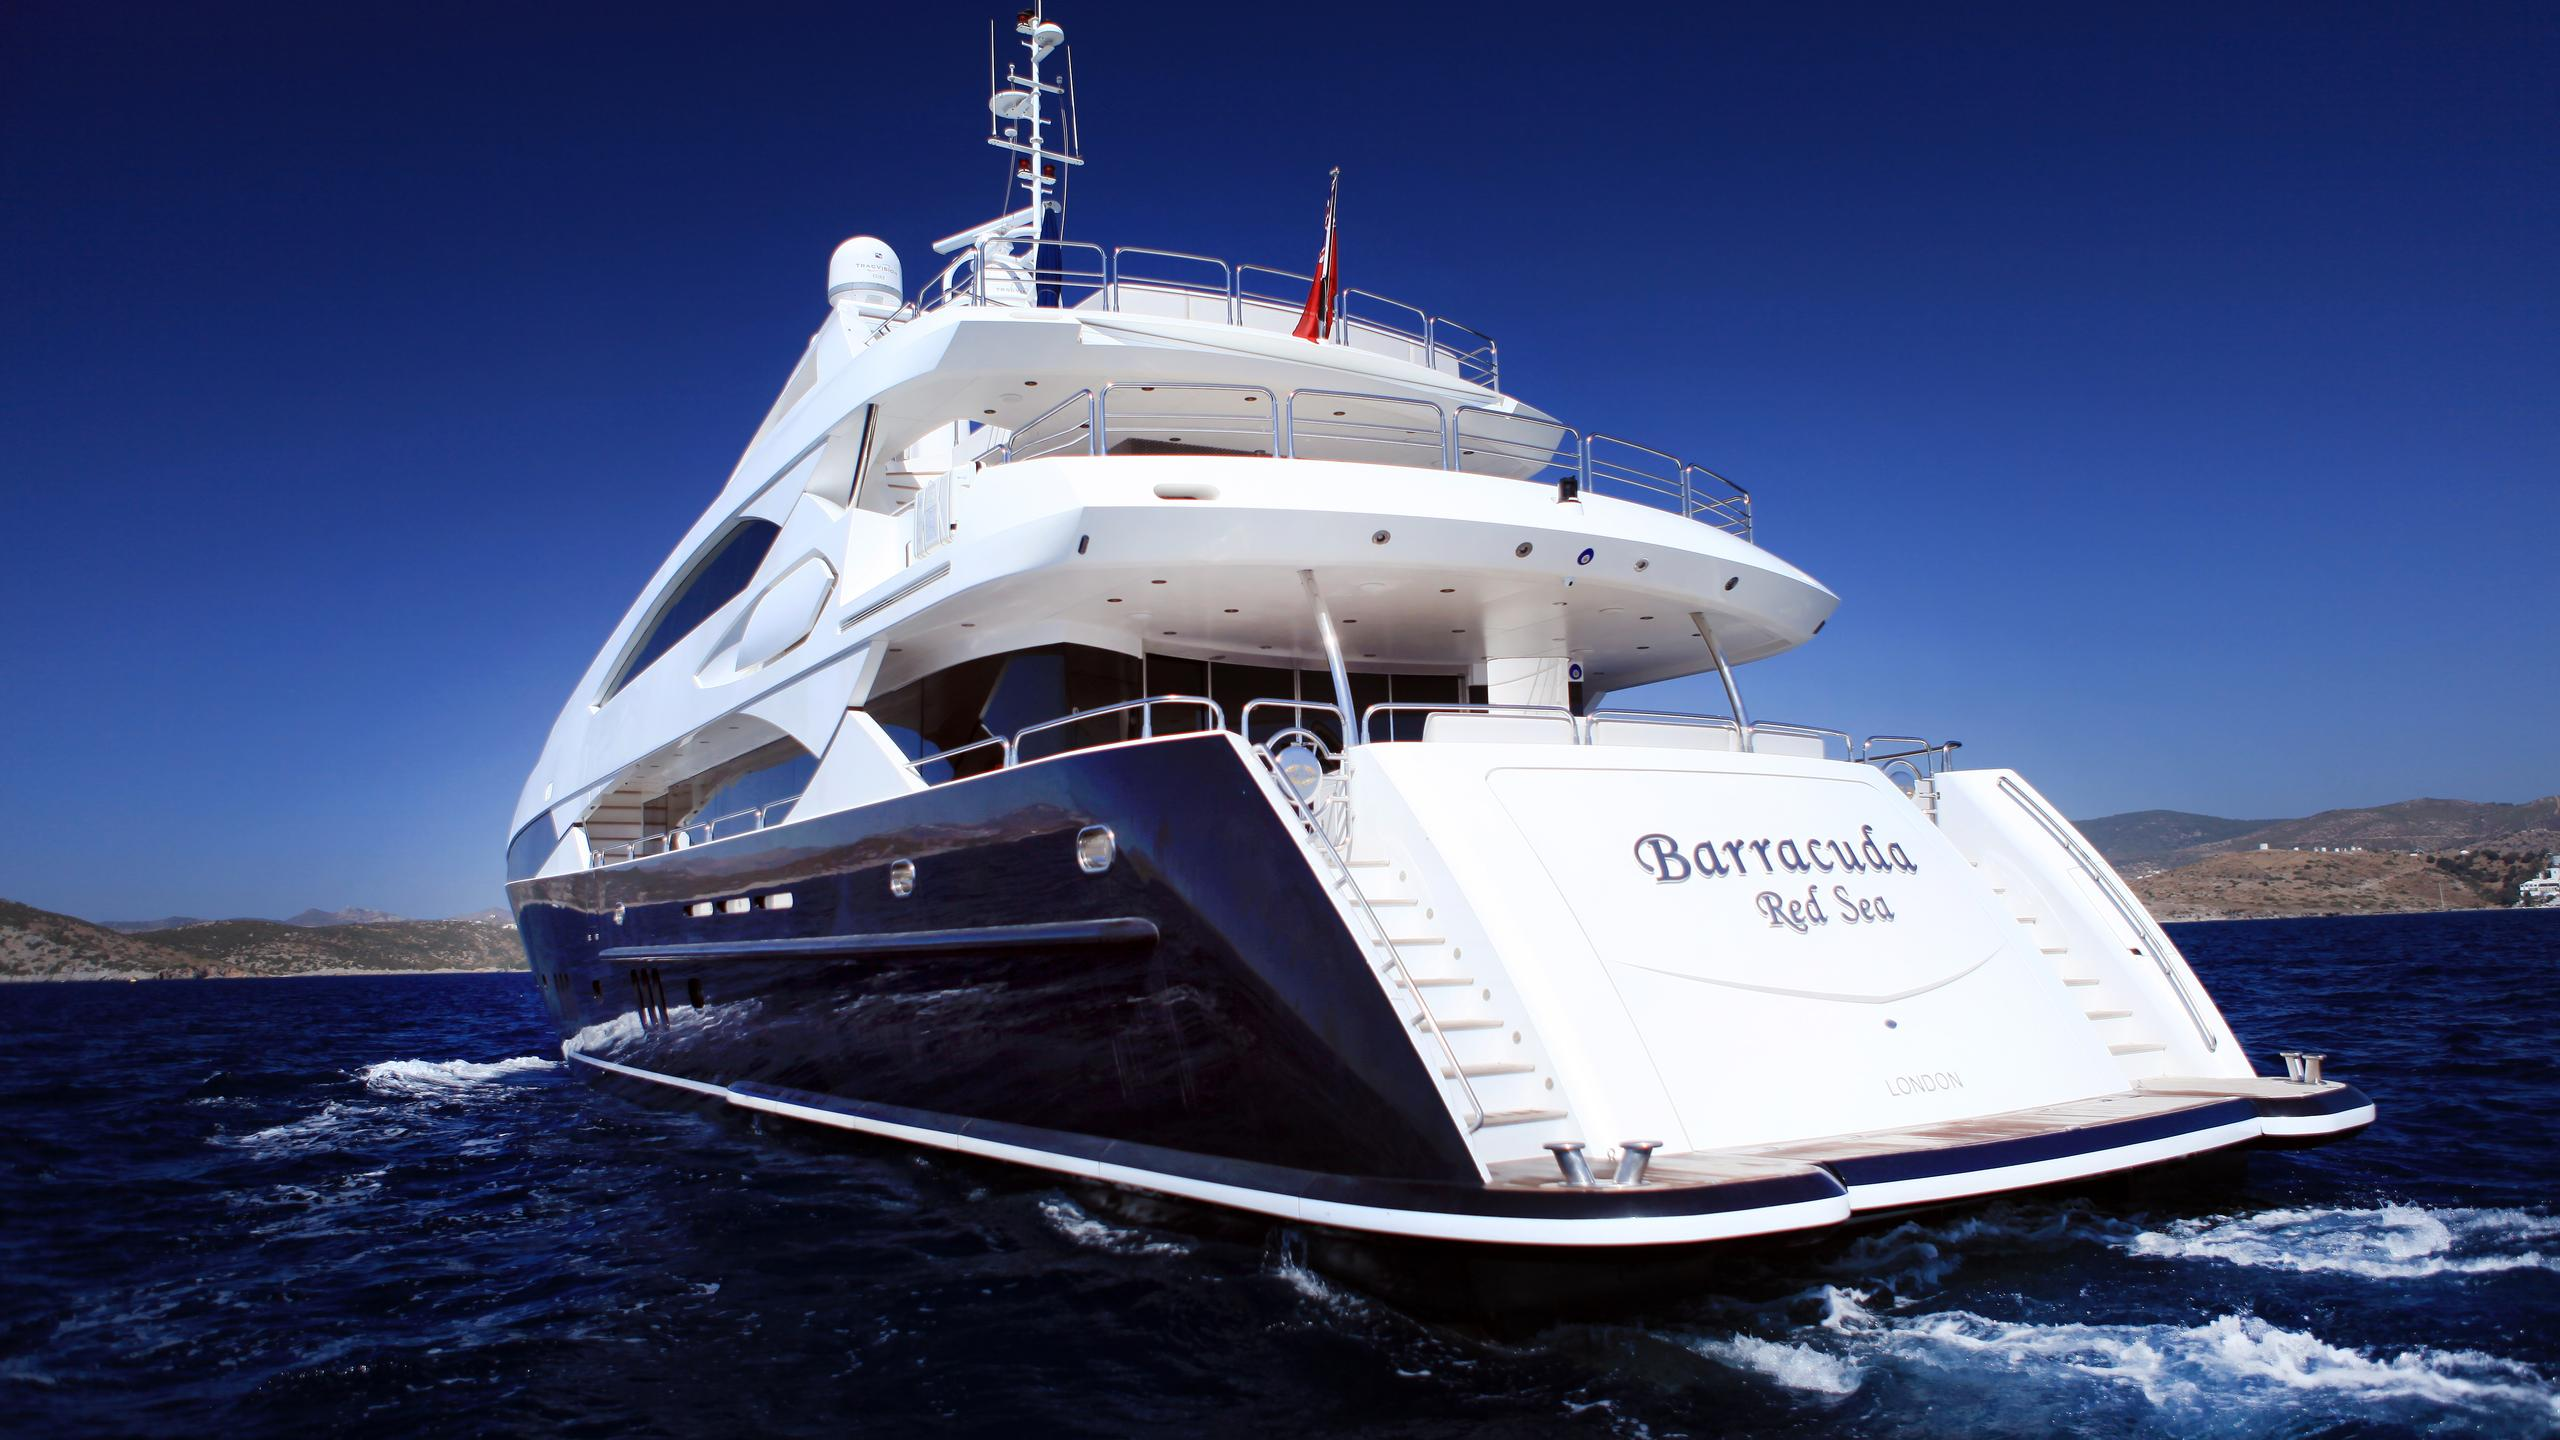 barracuda-red-sea-yacht-cruising